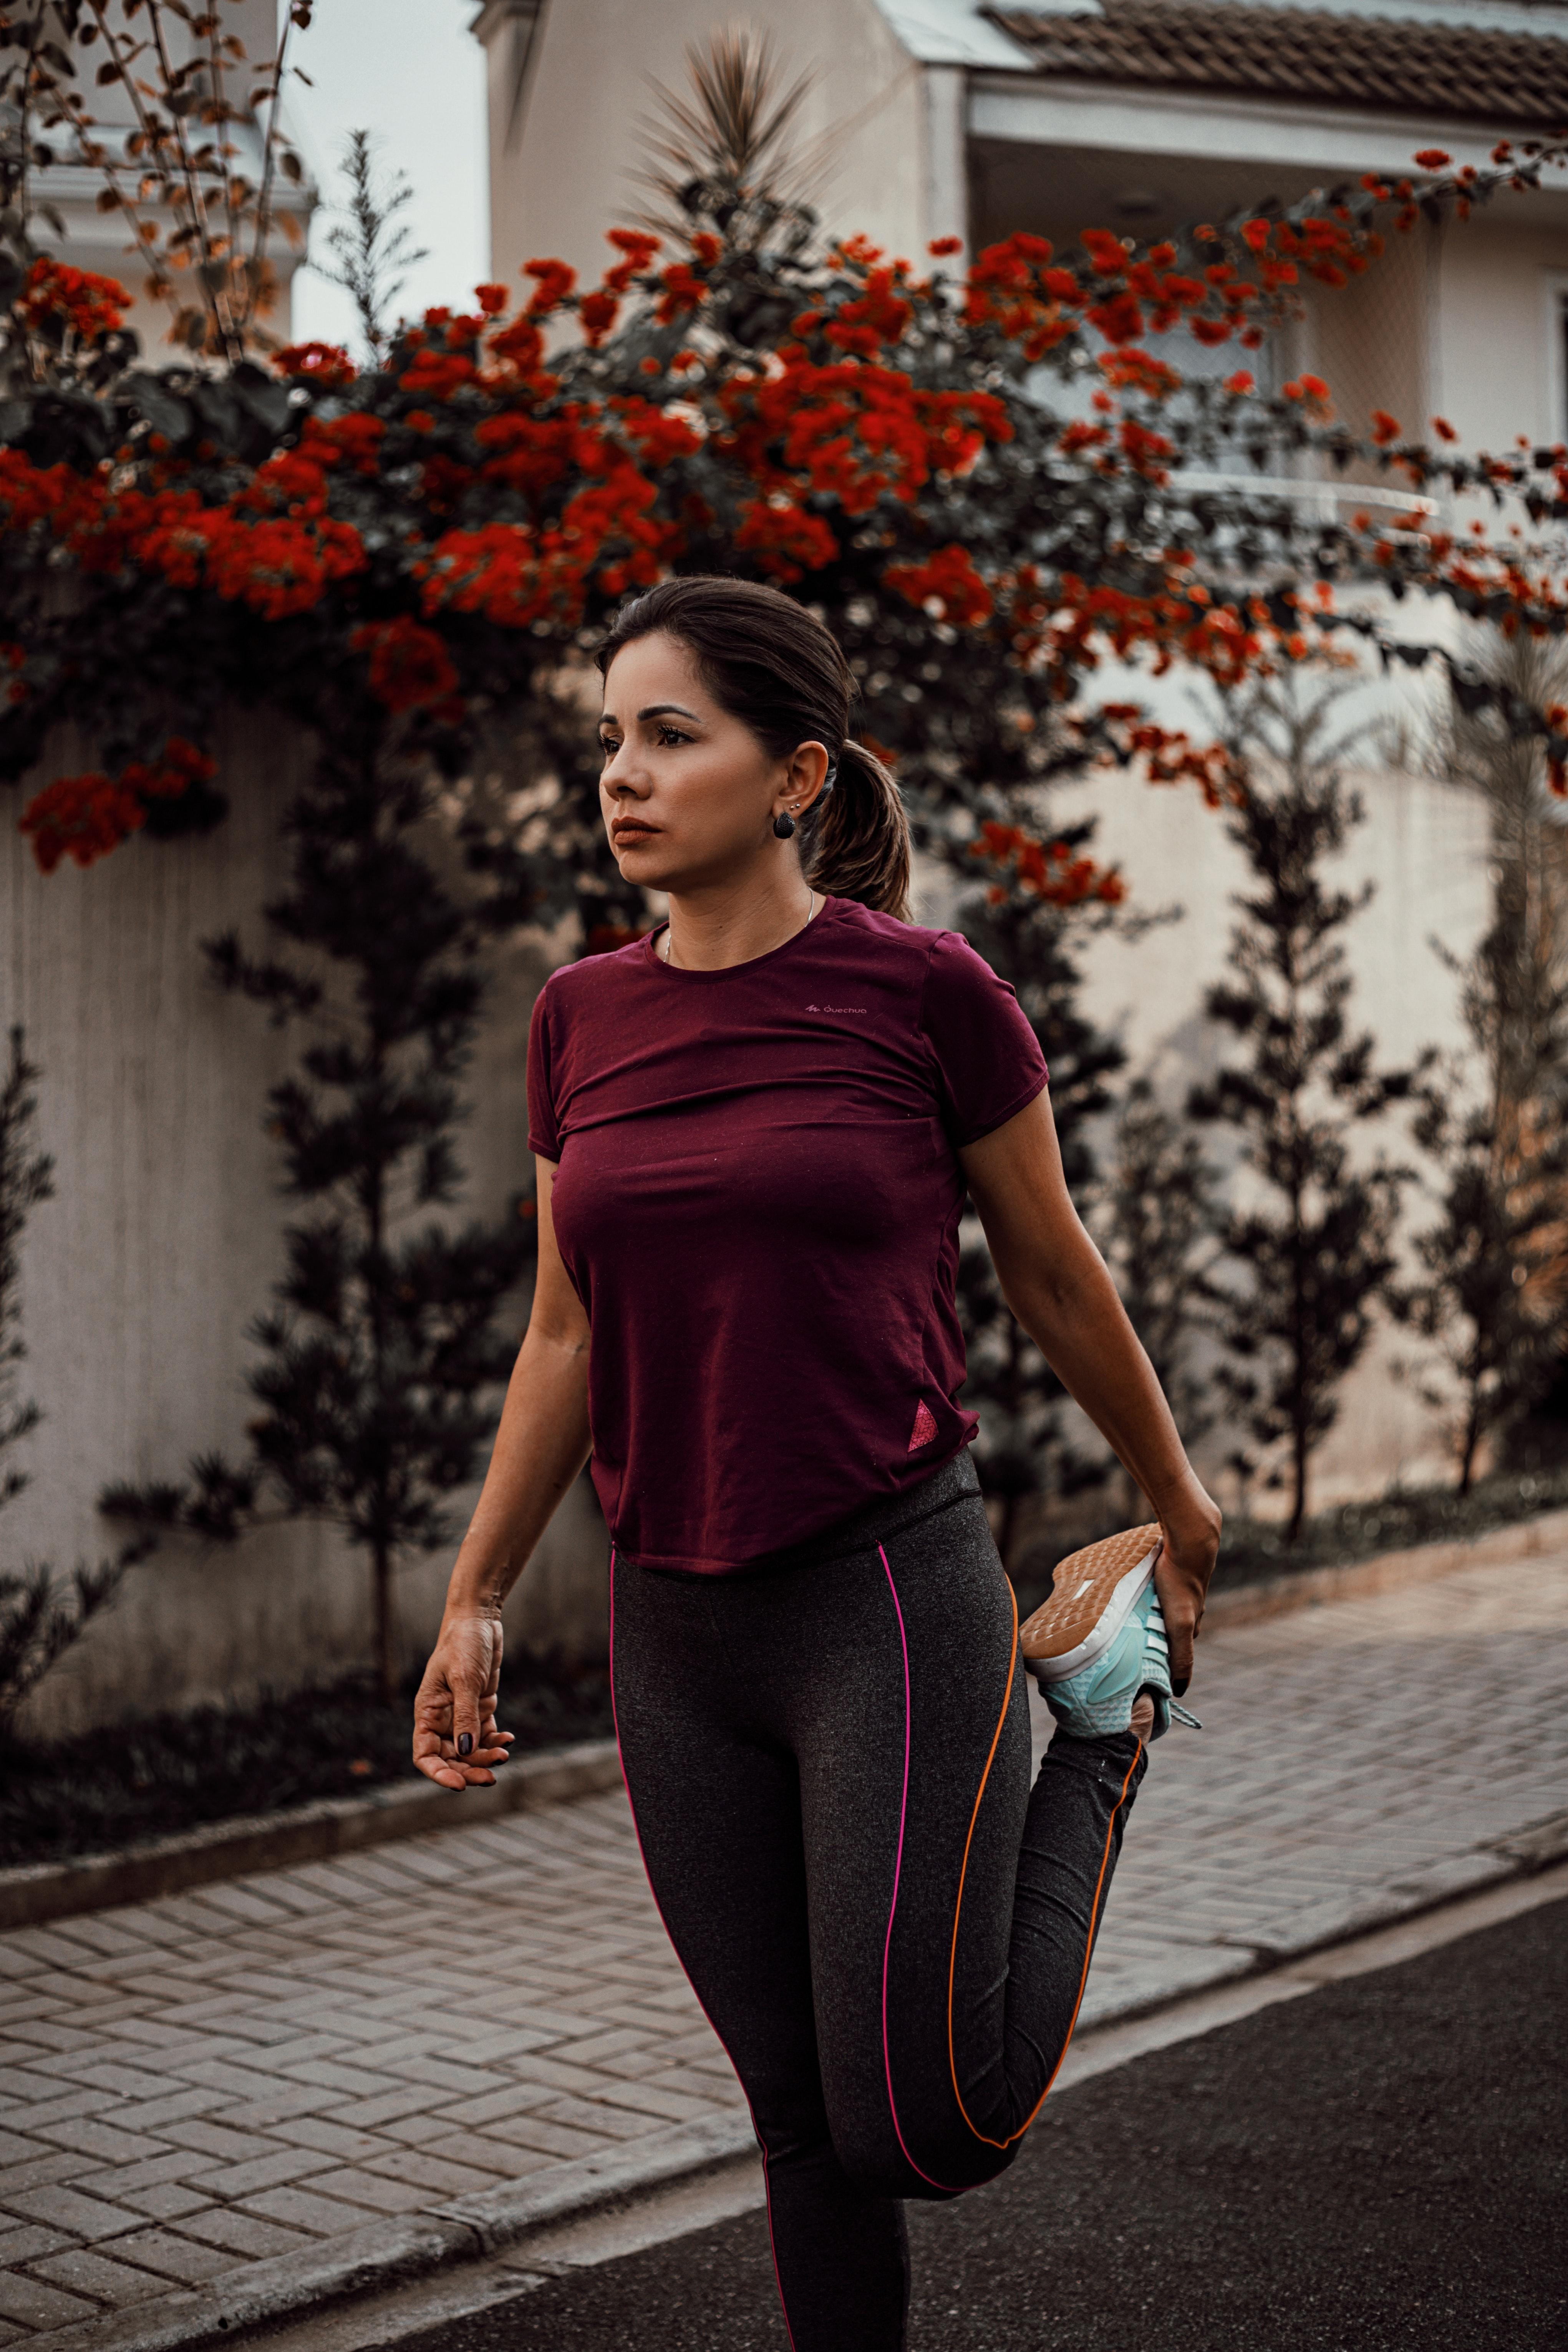 Personal Training Los Gatos Exercise Program